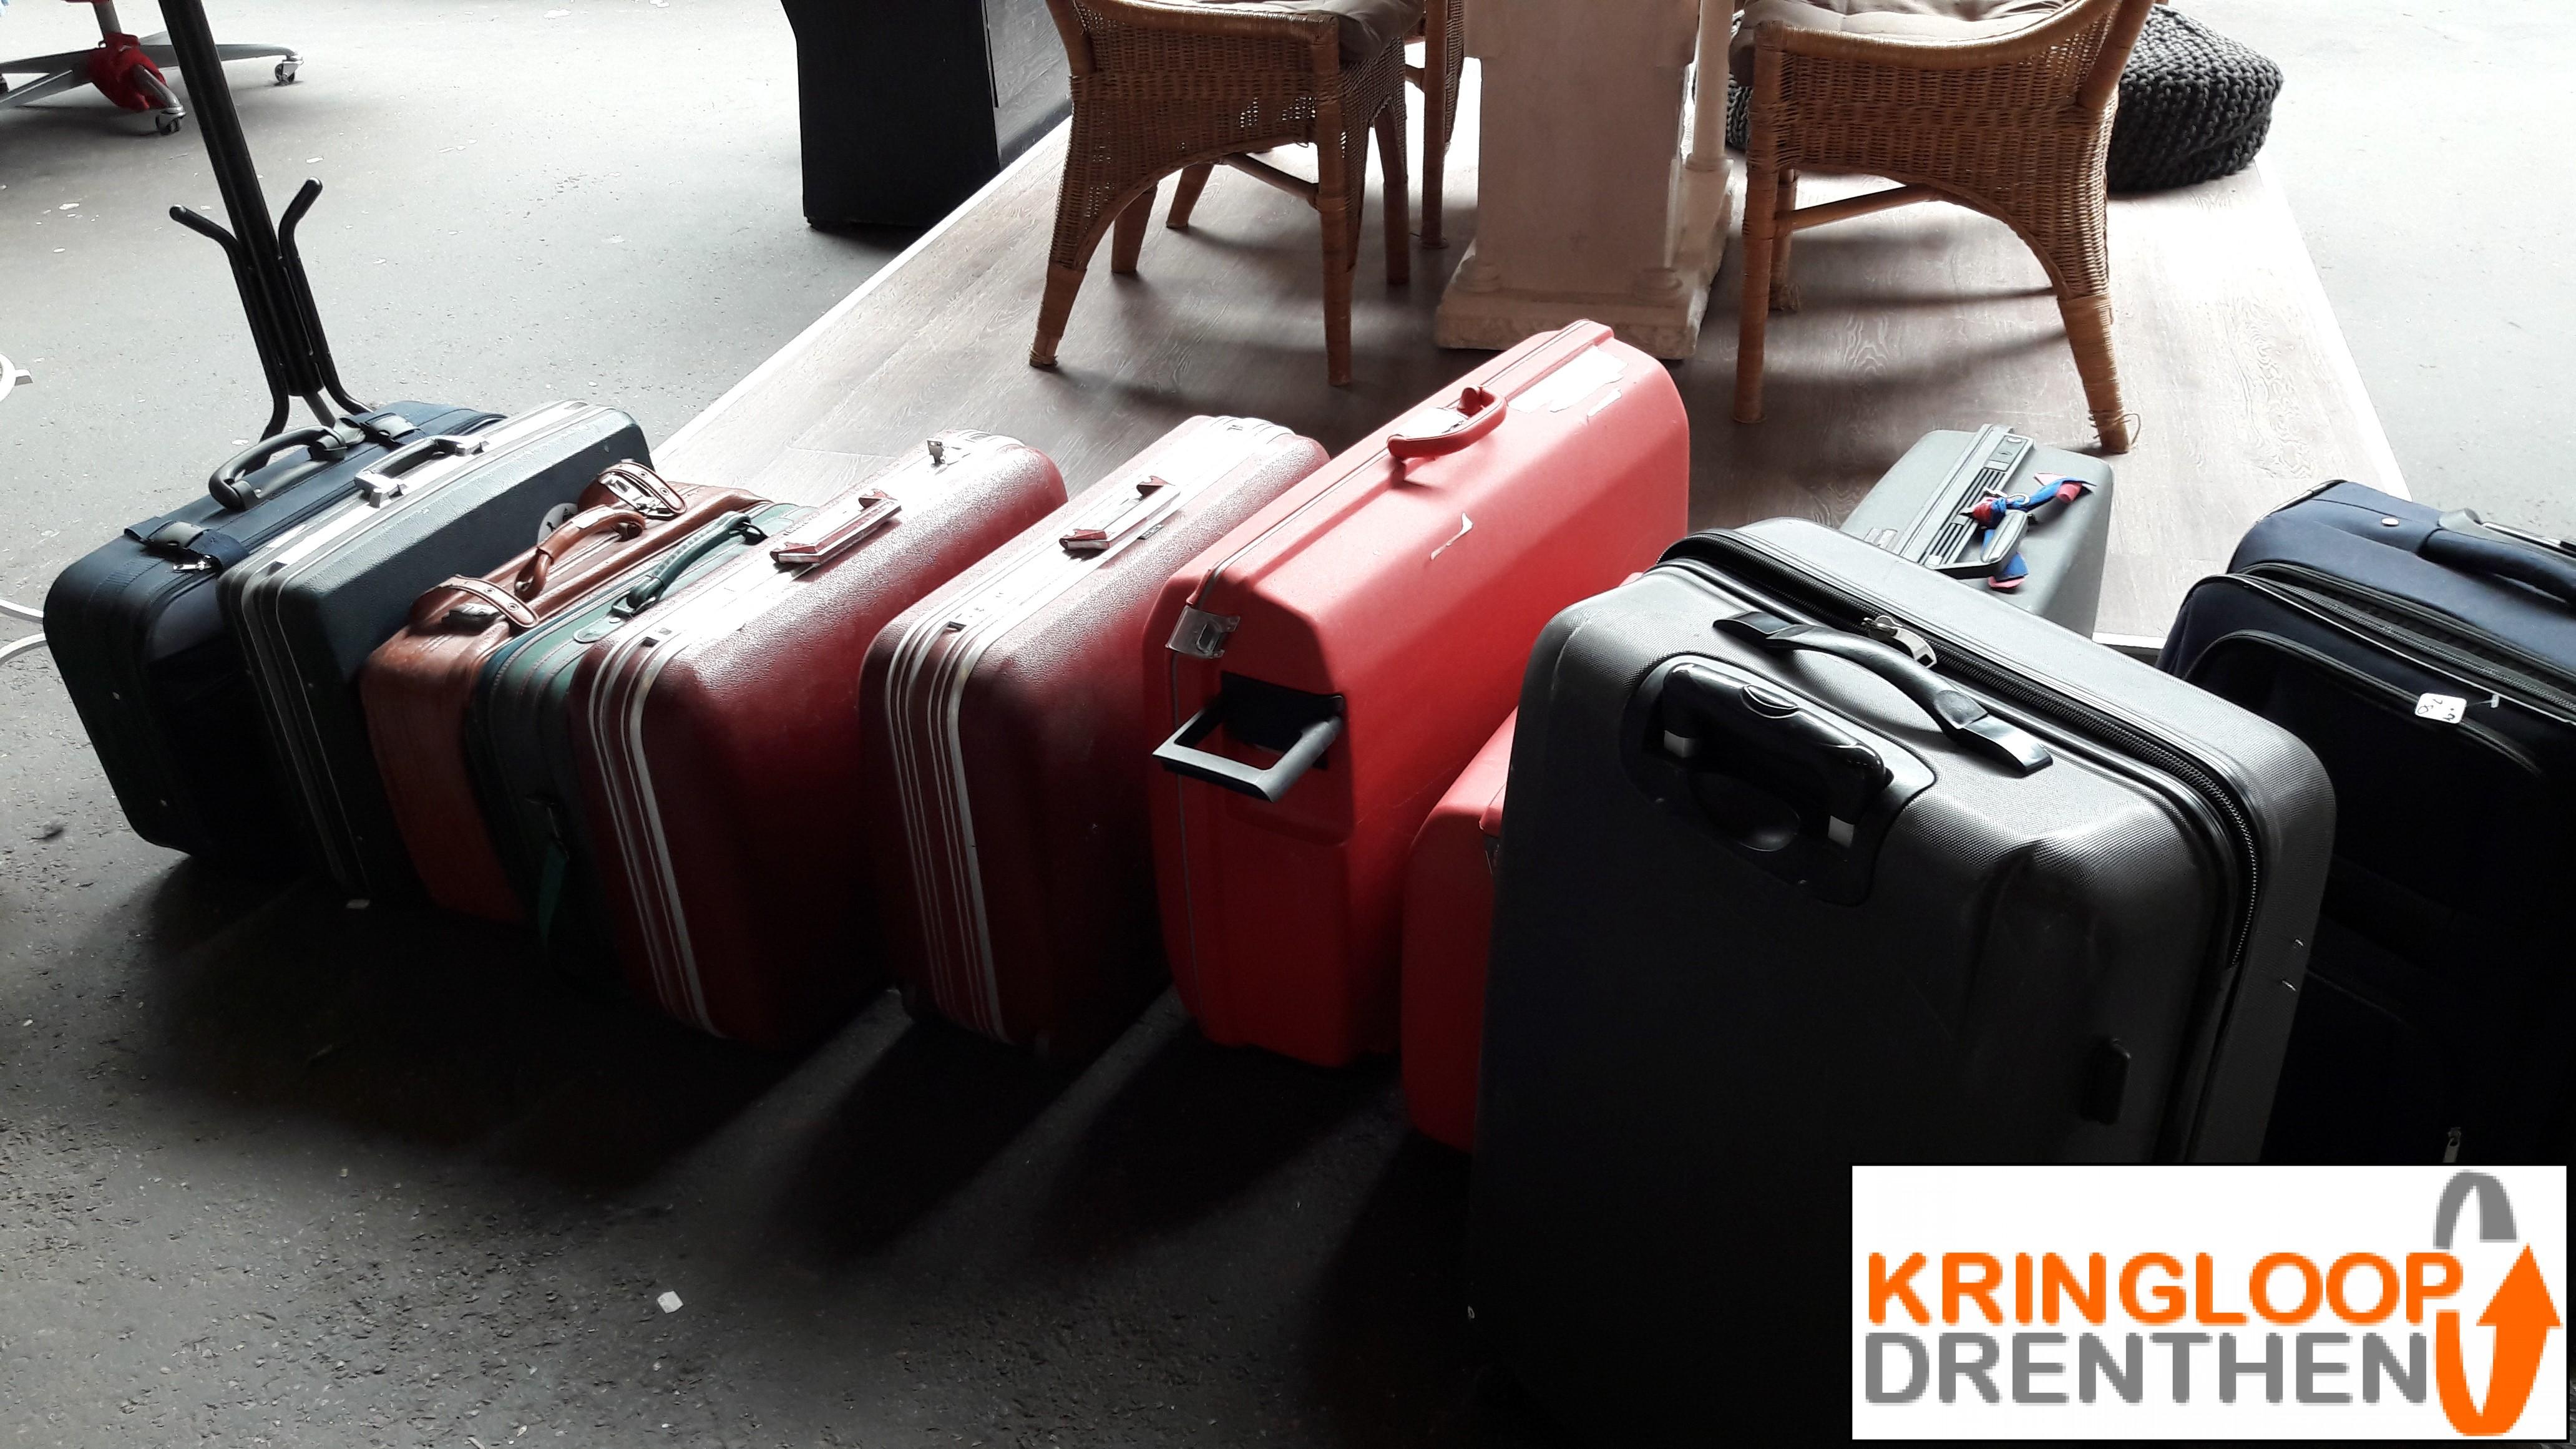 e6ac992c6e7 Te koop Div reiskoffers – Kringloop Drenthen